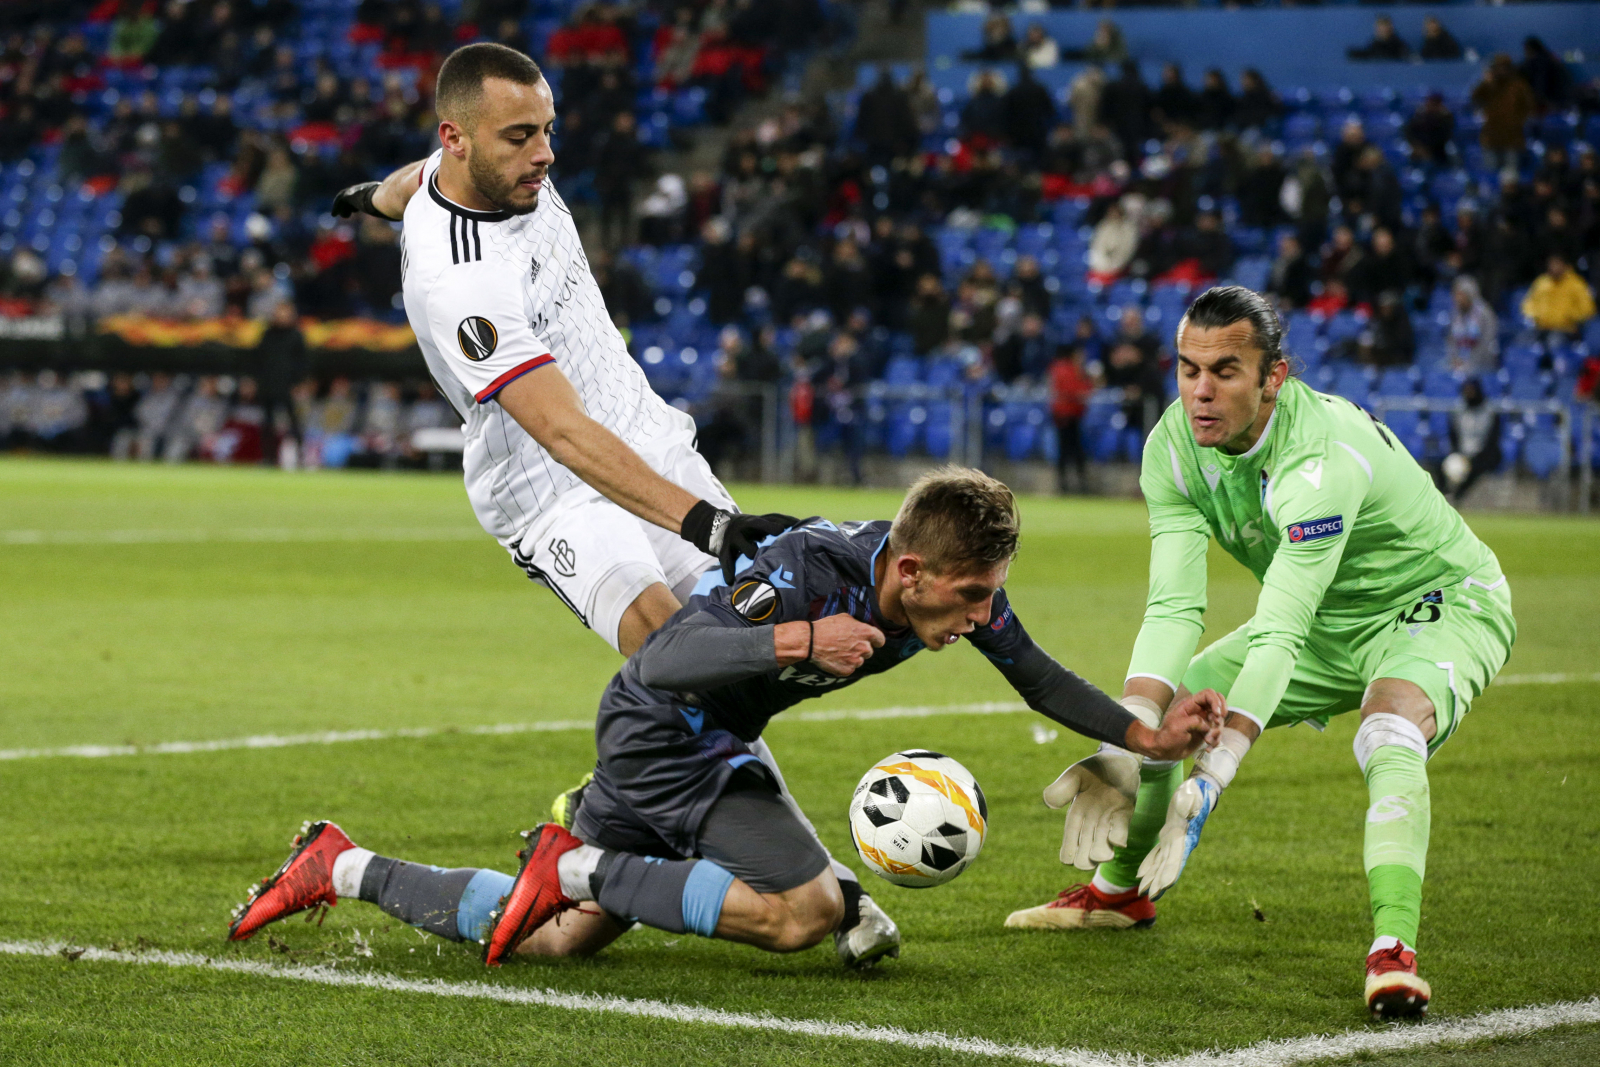 «Трабзонспор» - «Антальяспор»: прогноз на матч турецкой Суперлиги